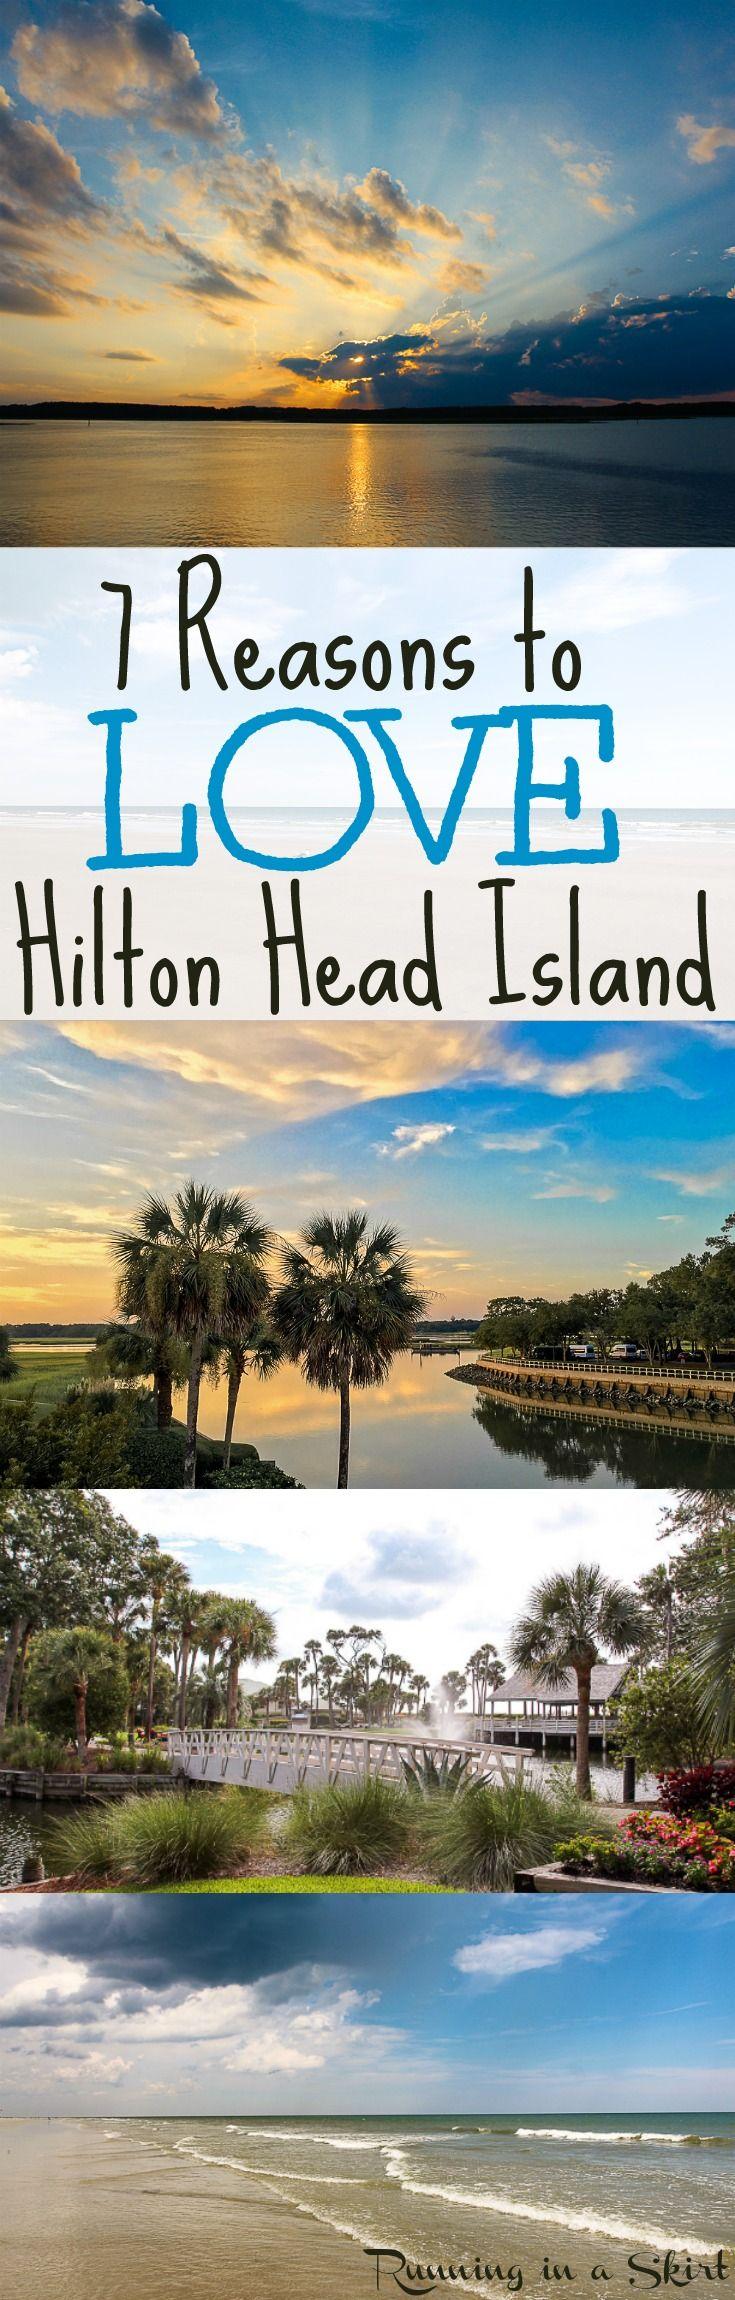 best 10+ hotels hilton head ideas on pinterest   hotels hilton